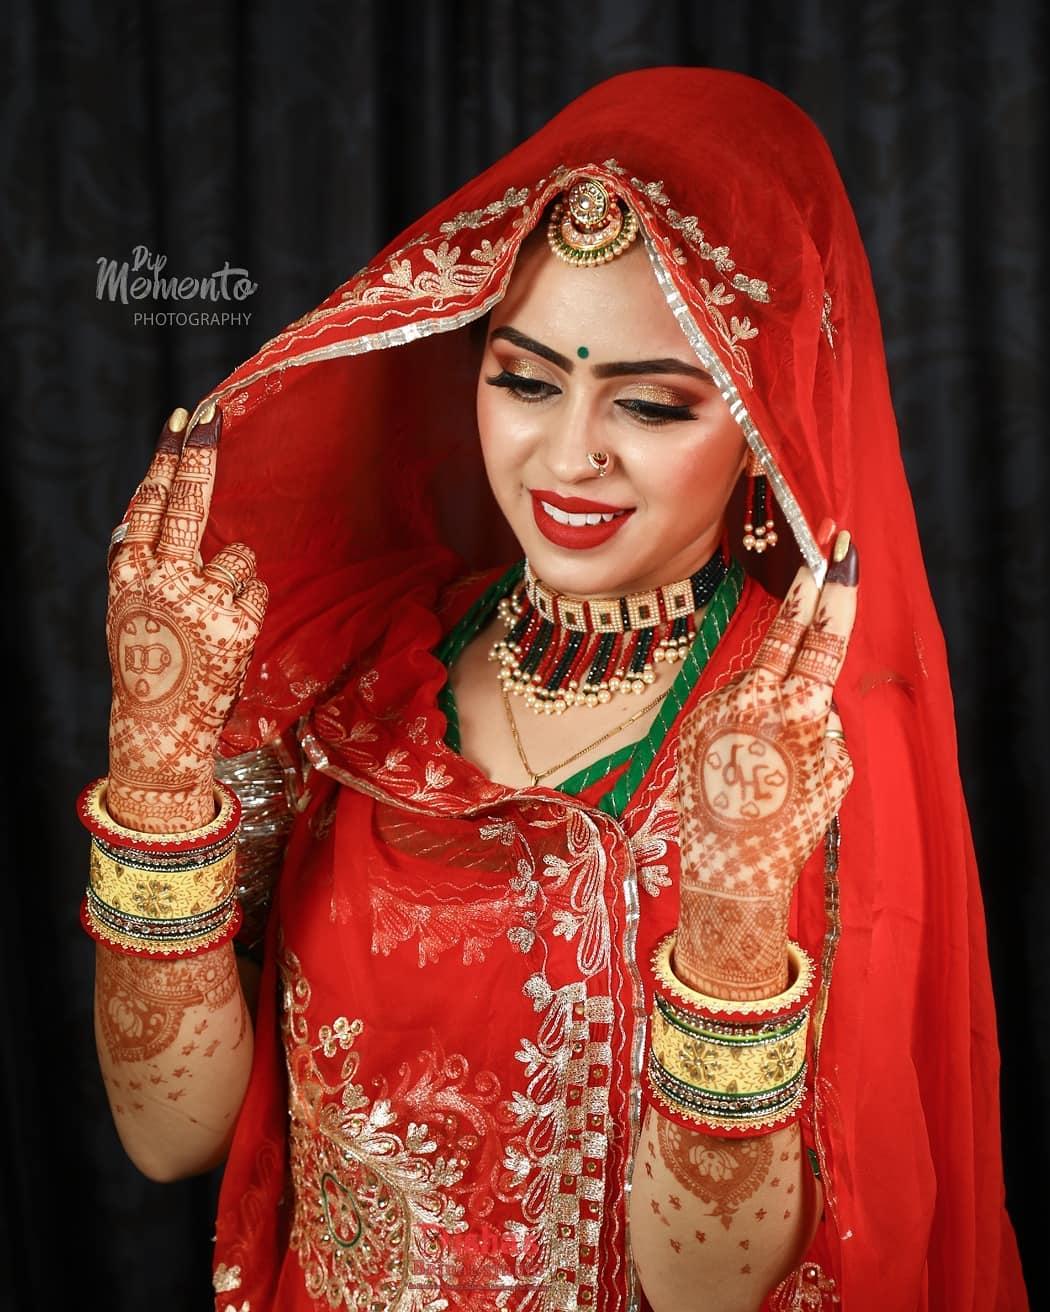 The mirror of divine Beauty... Marwadi Bride . . 📸@dip_memento_photography 💄@dishasbridalstudio . .  #brides #marwadibride #bridetobe #coolbrides #bigfatindianwedding #bridemakeup #indianwedding #photography #weddings #indianwedding #dipmementophotography #9924227745 #loveformakeup #marwari #makeupartist #makeup #ahmedabad #candidportraits #indianbride #indianfashionblogger #marwadistyle #rajasthanibride #brides #funbrides . . @wedzo.in @indianstreetfashion @weddingz.in @indian_wedding_bliss @dulhaanddulhan @thebridesofindia @indianweddings @weddingdream @indianweddingbuzz @shaadisaga @zo_wed @desiclassybrides @weddingwireindia @indiagramwedding @shaadisaga @indian__wedding @thebridesofindia @weddingsutra @wedmegood @bridalaffairind @theweddingbrigade @weddingplz @weddingfables @indian_wedding_inspiration @eventilaindia @_punjabi_weddings